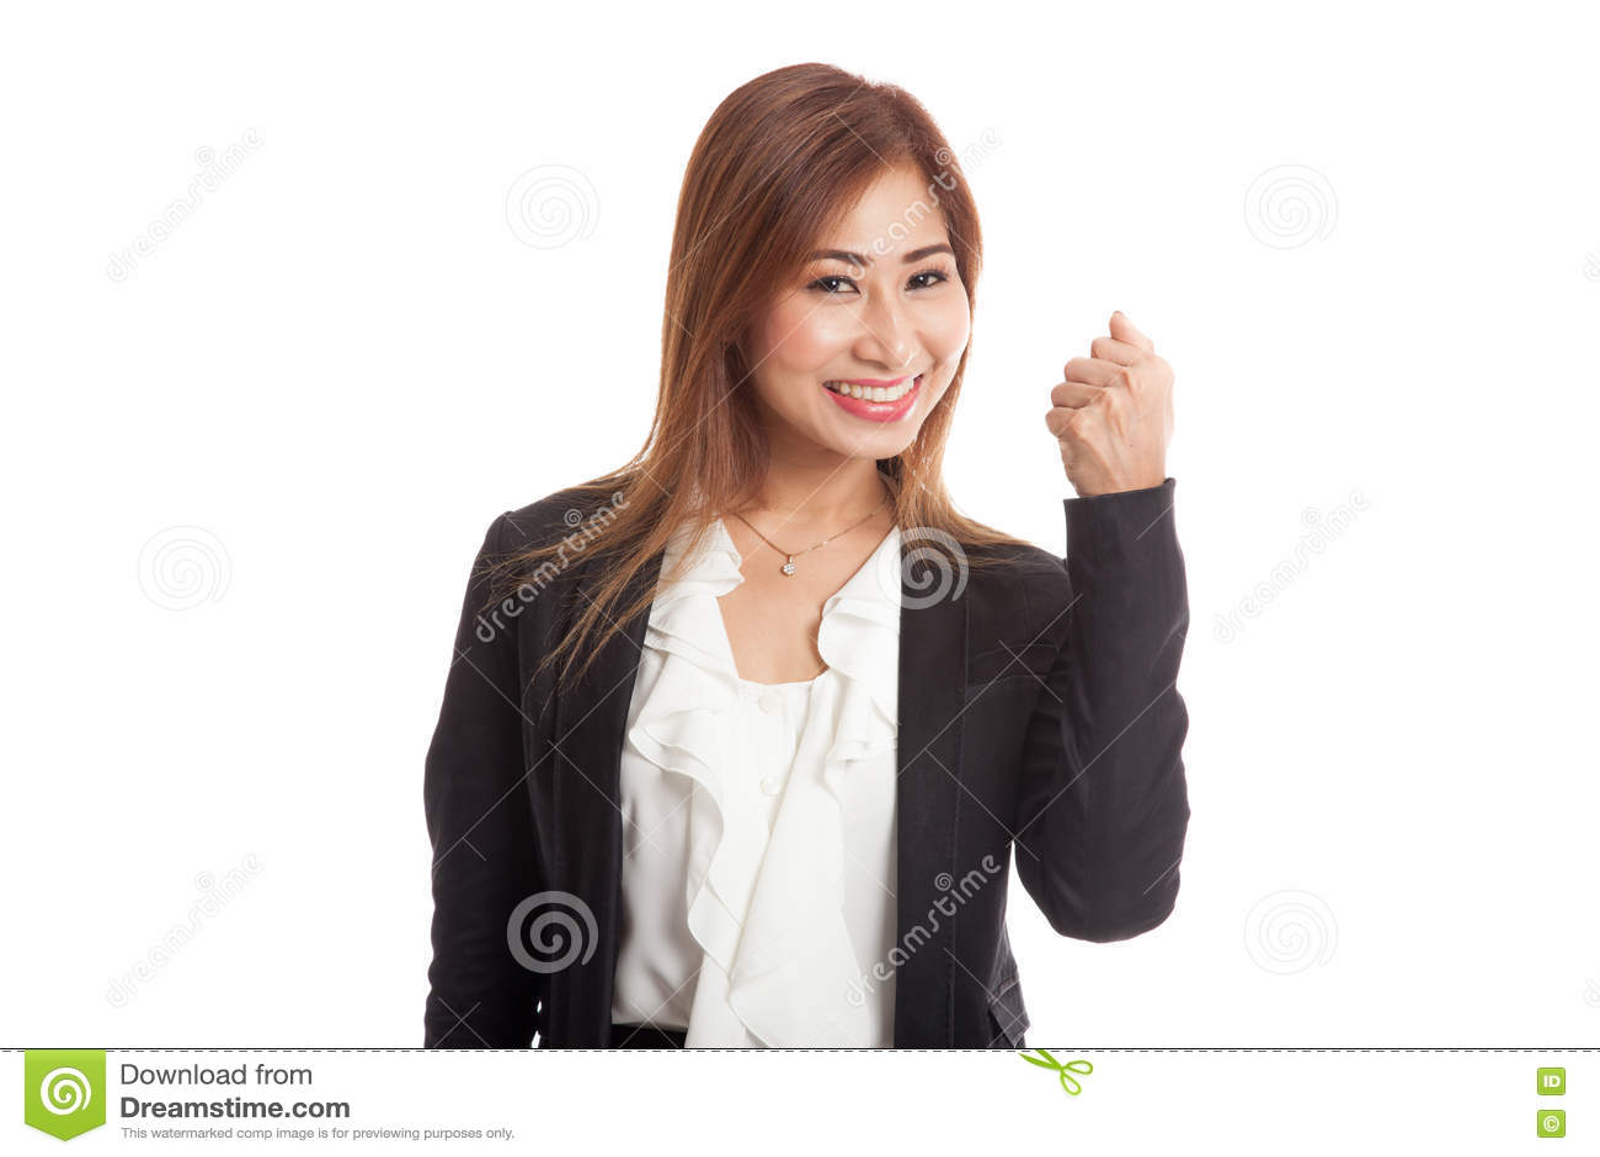 Gay anal fisting picks